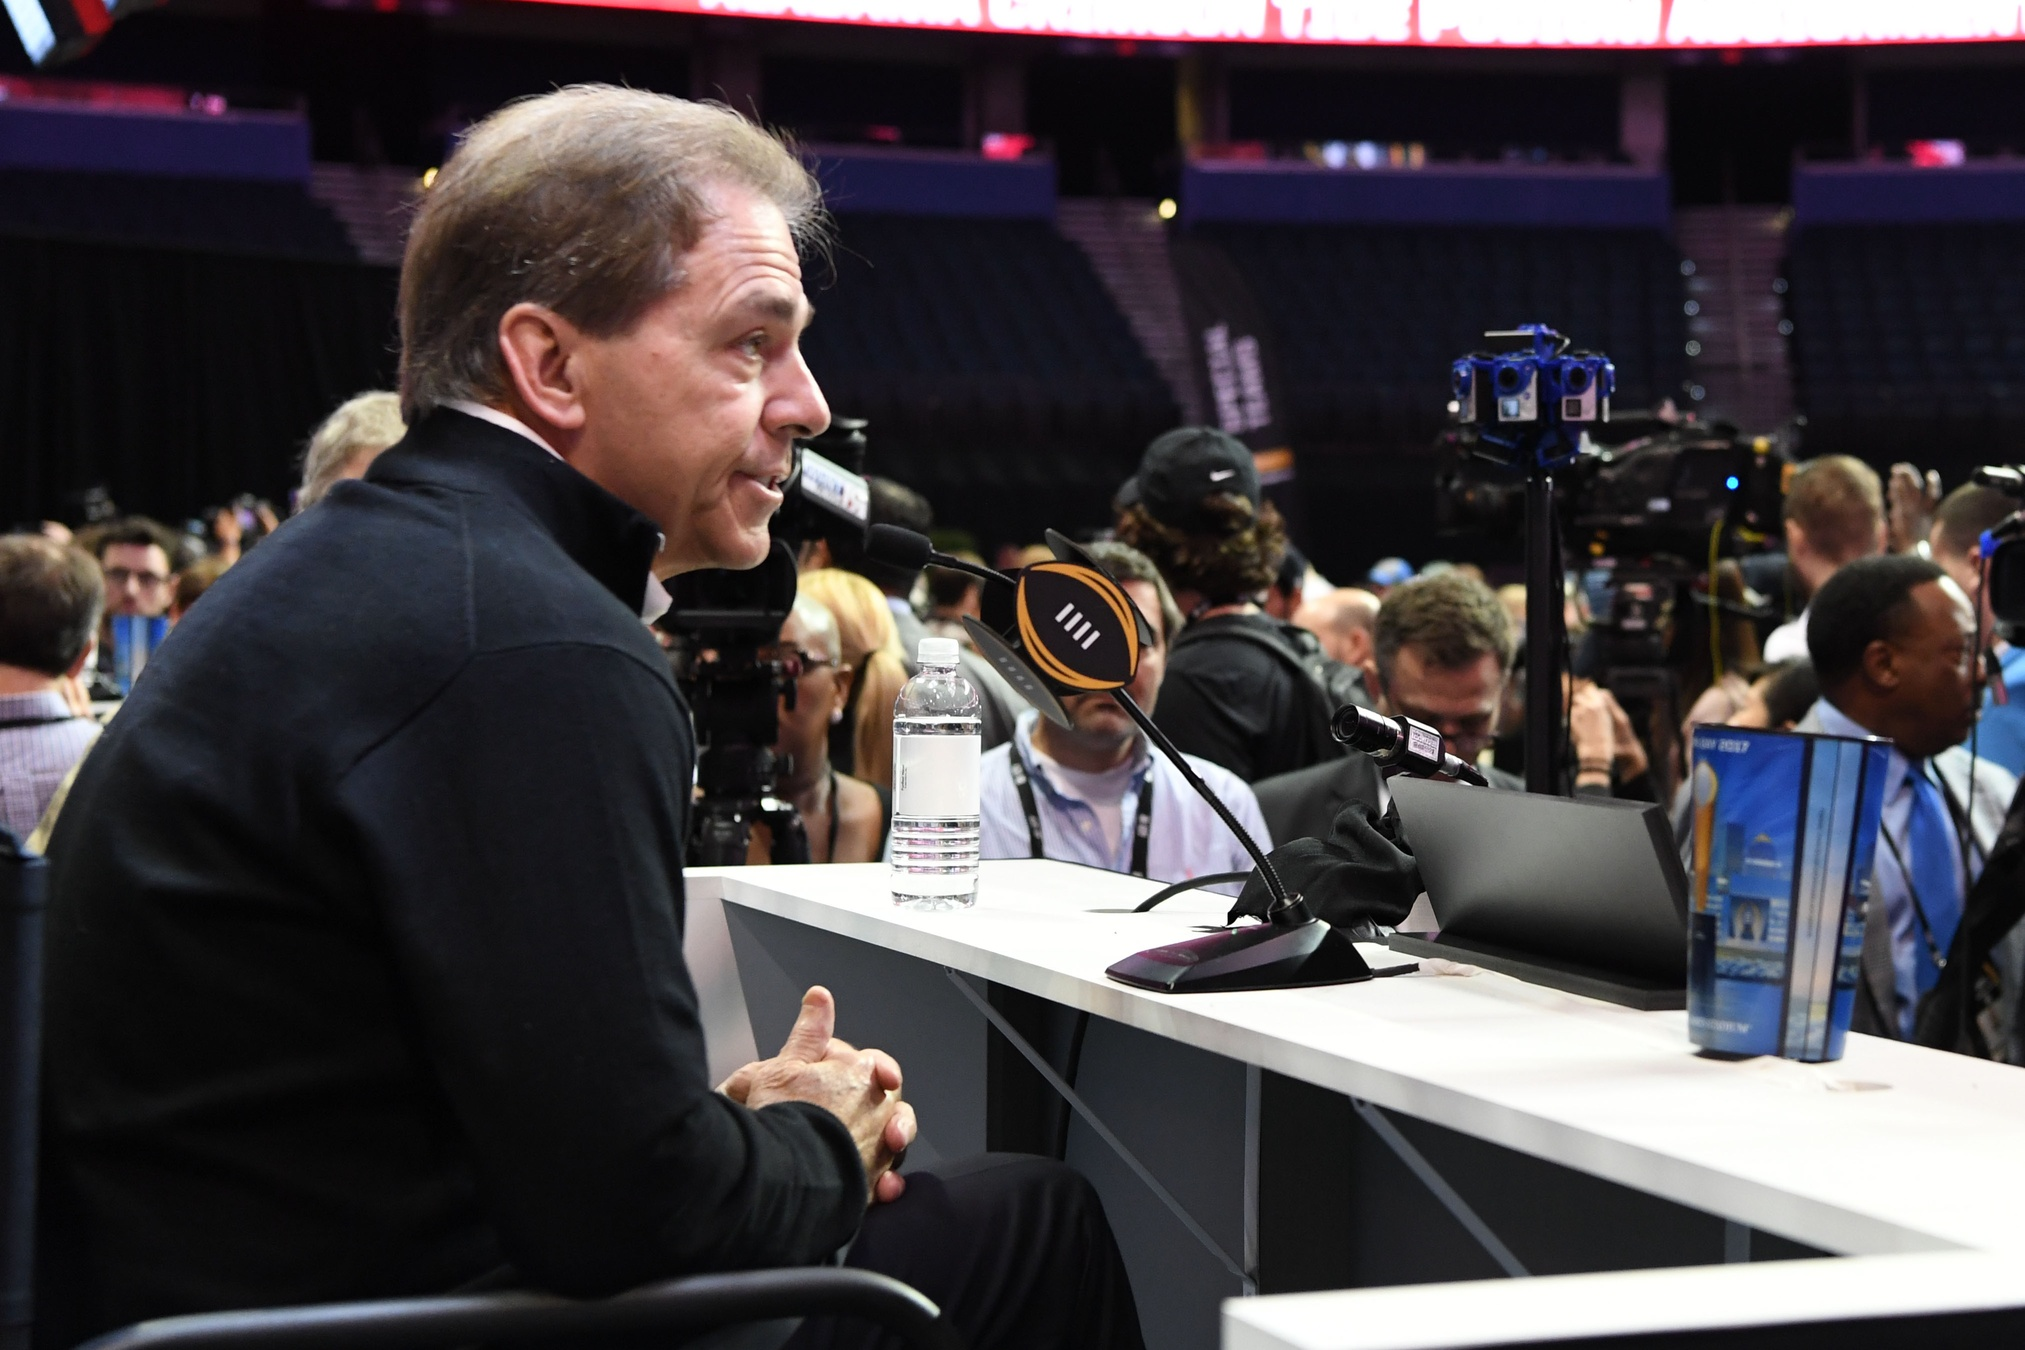 Jan 7, 2017; Tampa, FL, USA; Alabama Crimson Tide head coach Nick Saban during the Alabama Crimson Tide media day at Amalie Arena. Mandatory Credit: John David Mercer-USA TODAY Sports